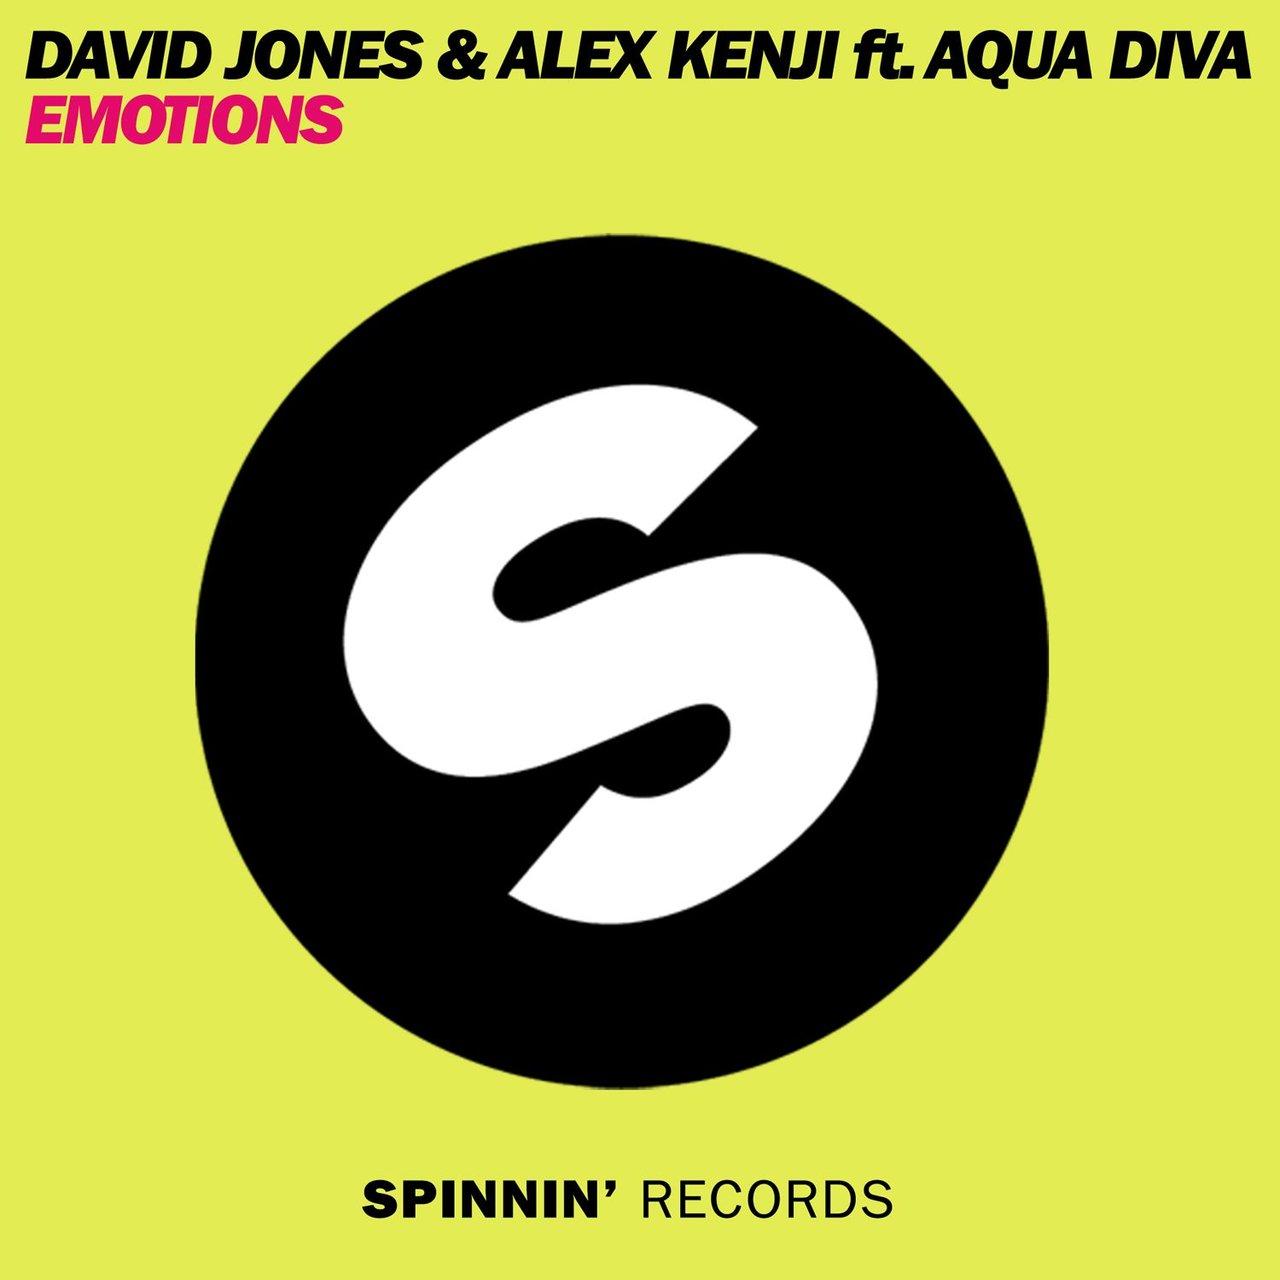 Tidal listen to david jones on tidal david jones emotions feat aqua diva buycottarizona Image collections